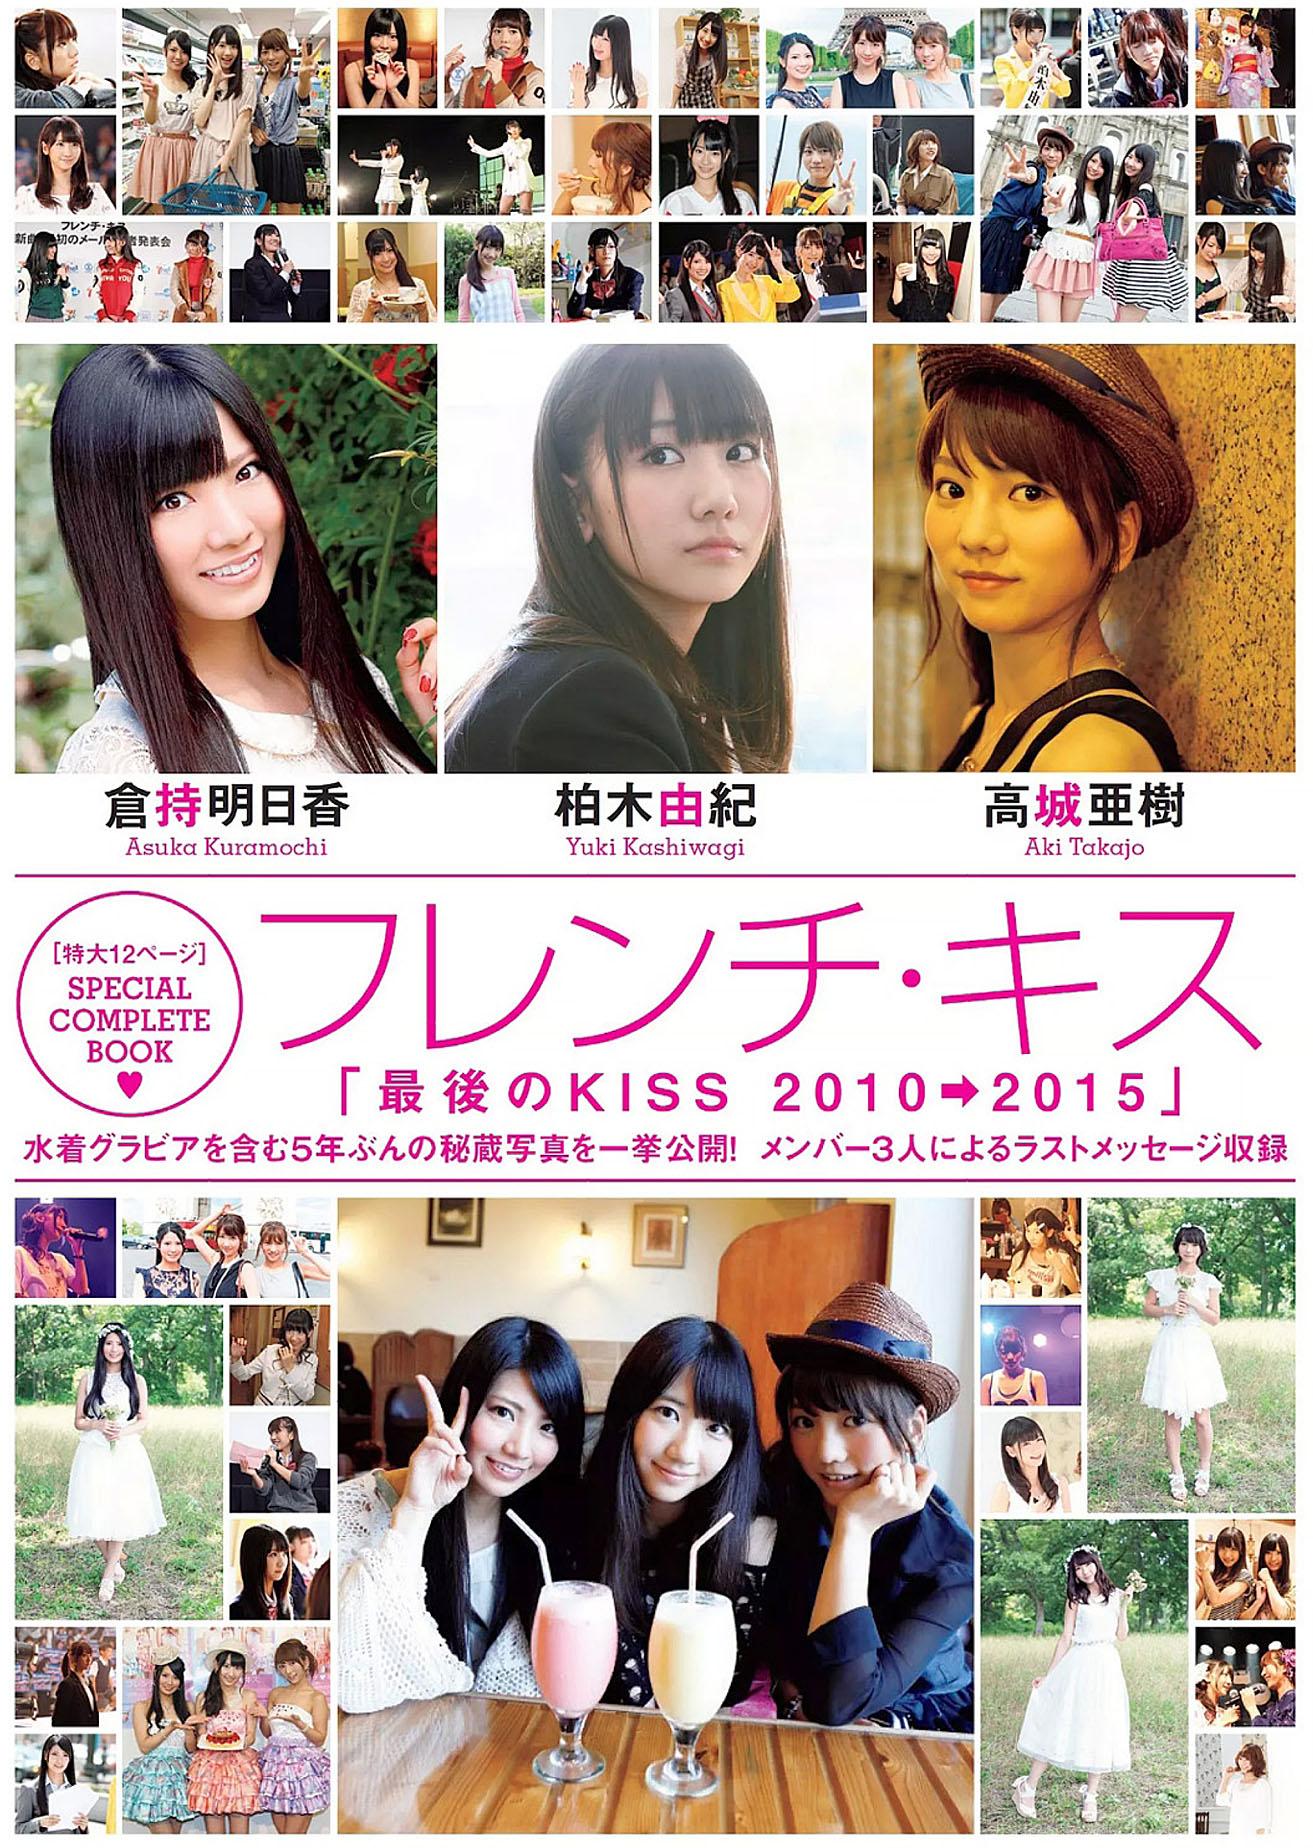 AKB48 French Kiss Flash 151124 02.jpg